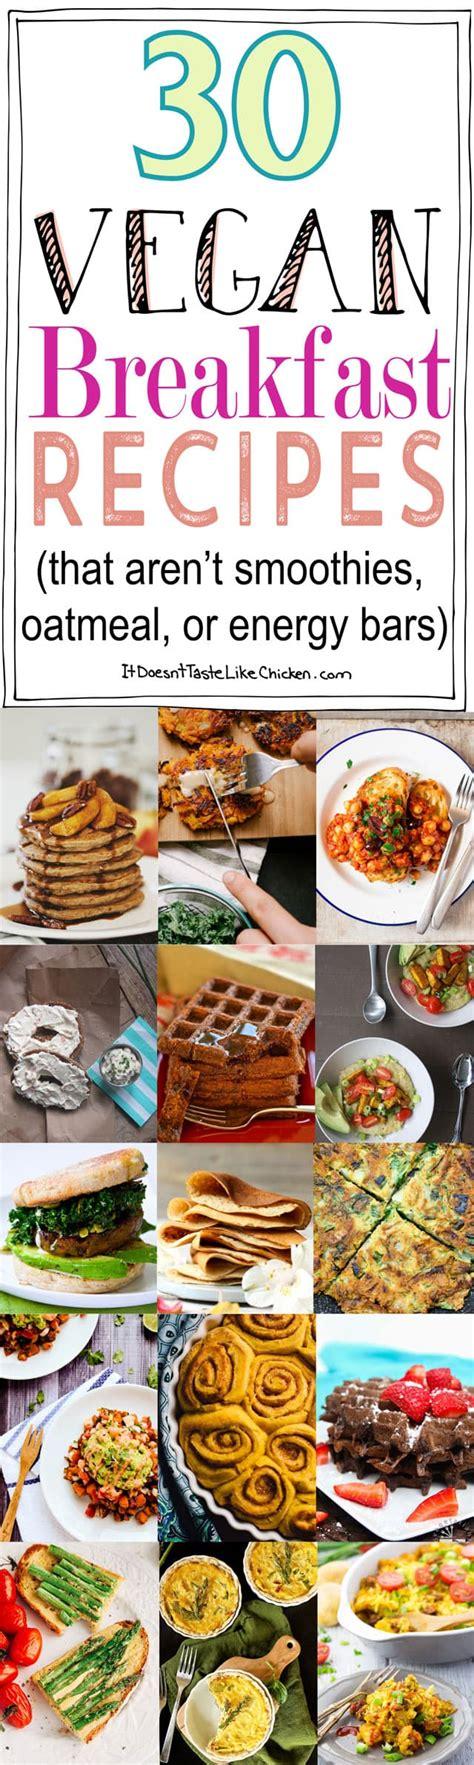 healthy vegan energy bars recipe 30 vegan breakfast recipes that aren t smoothies oatmeal